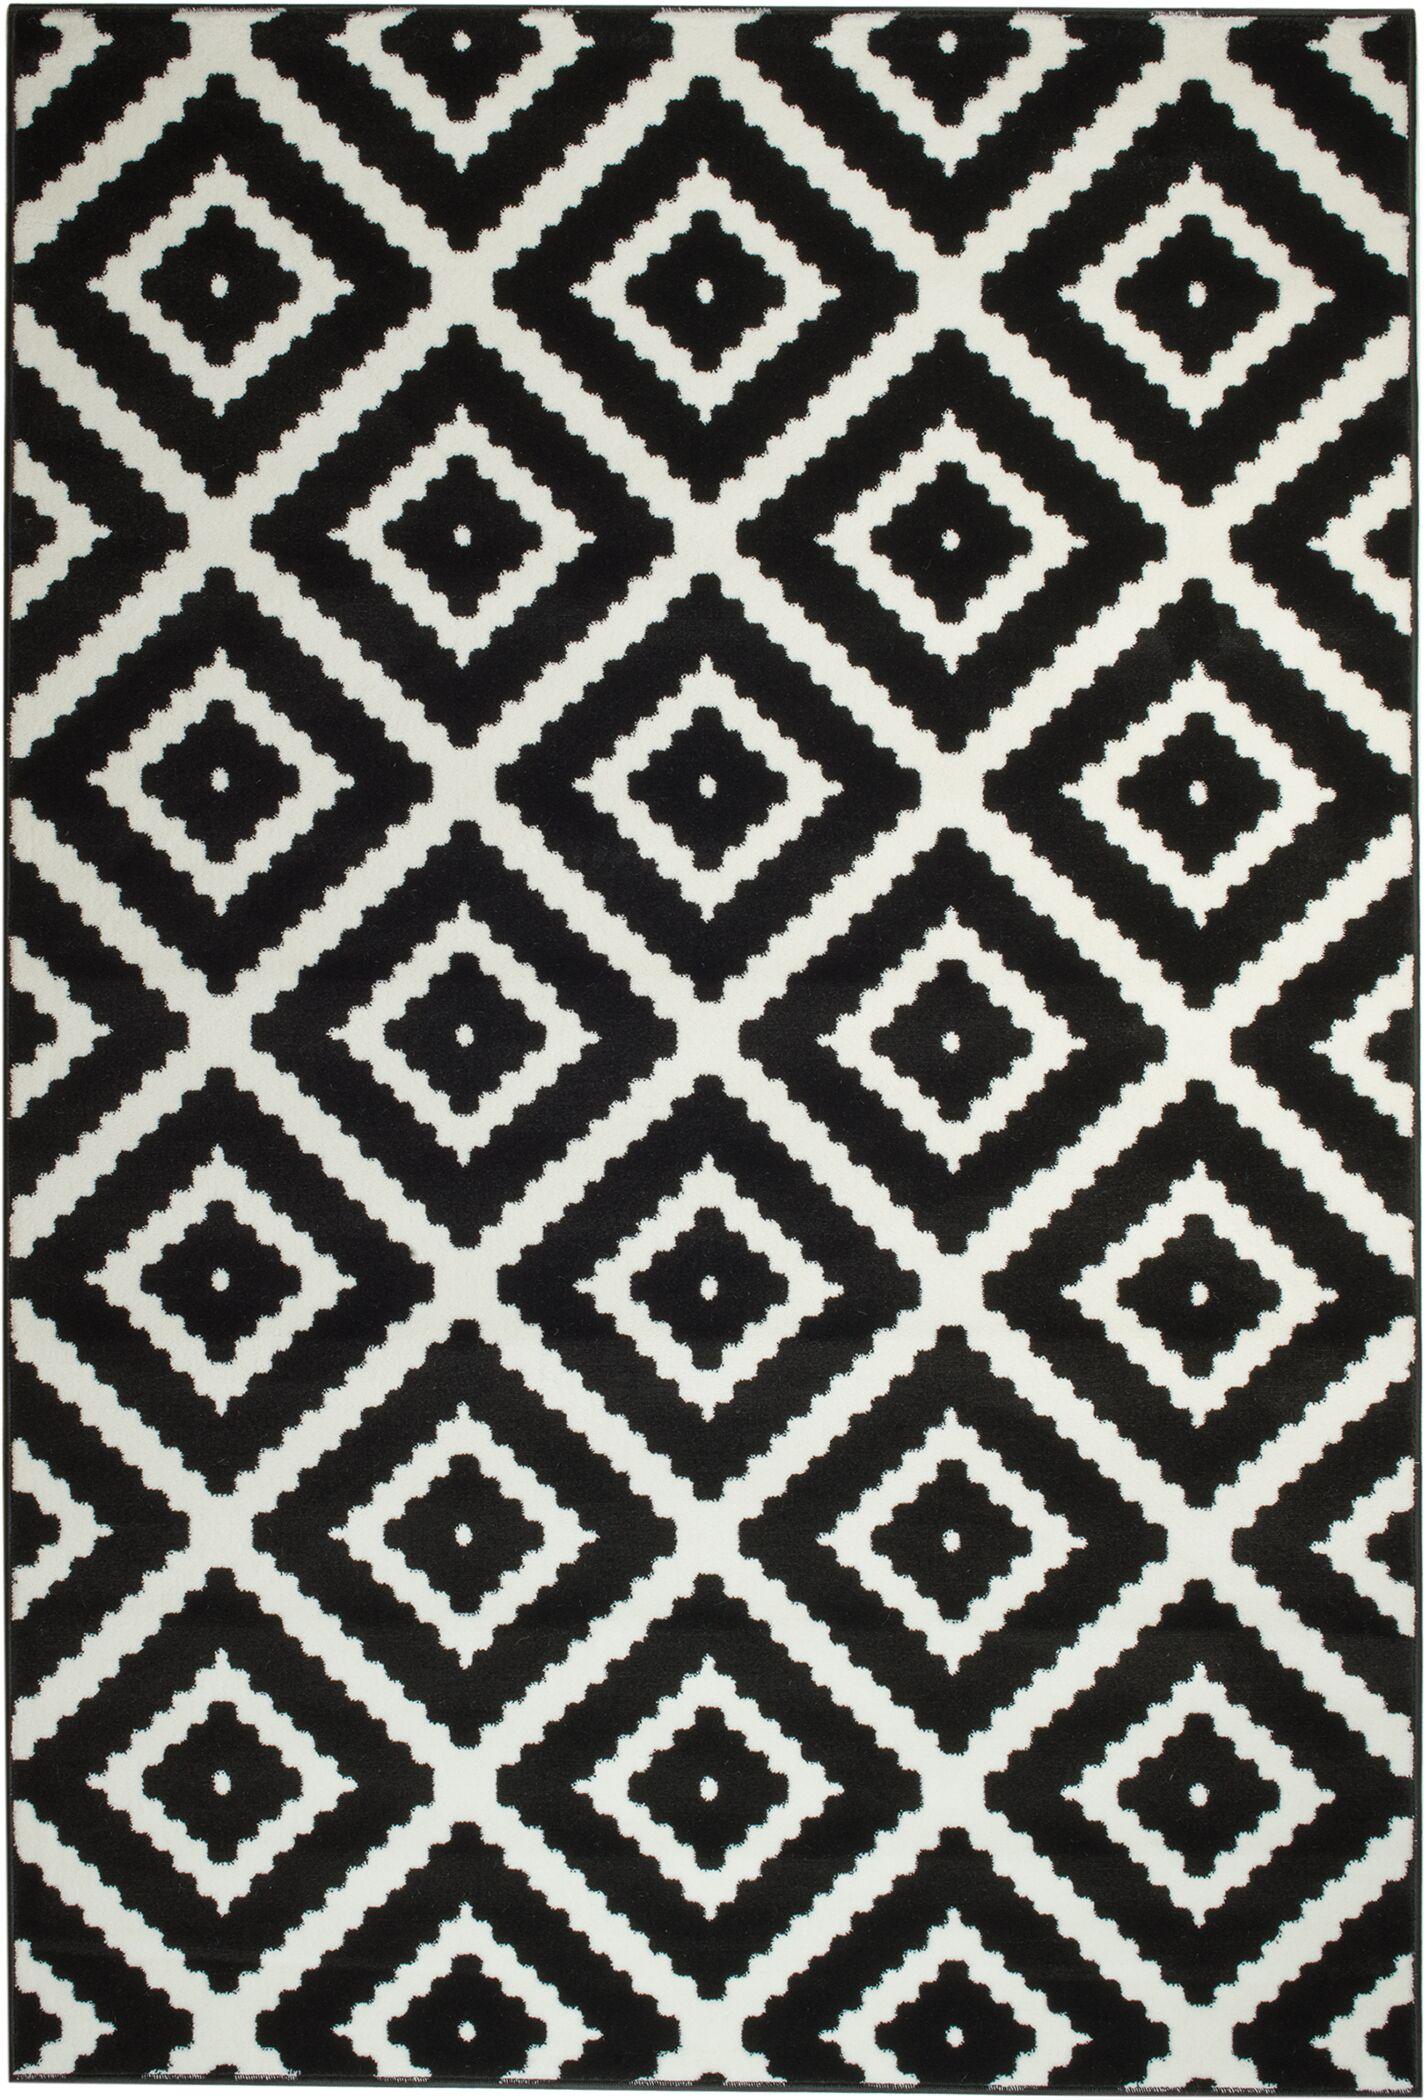 Cheney Black Indoor Area Rug Rug Size: Rectangle 7'4